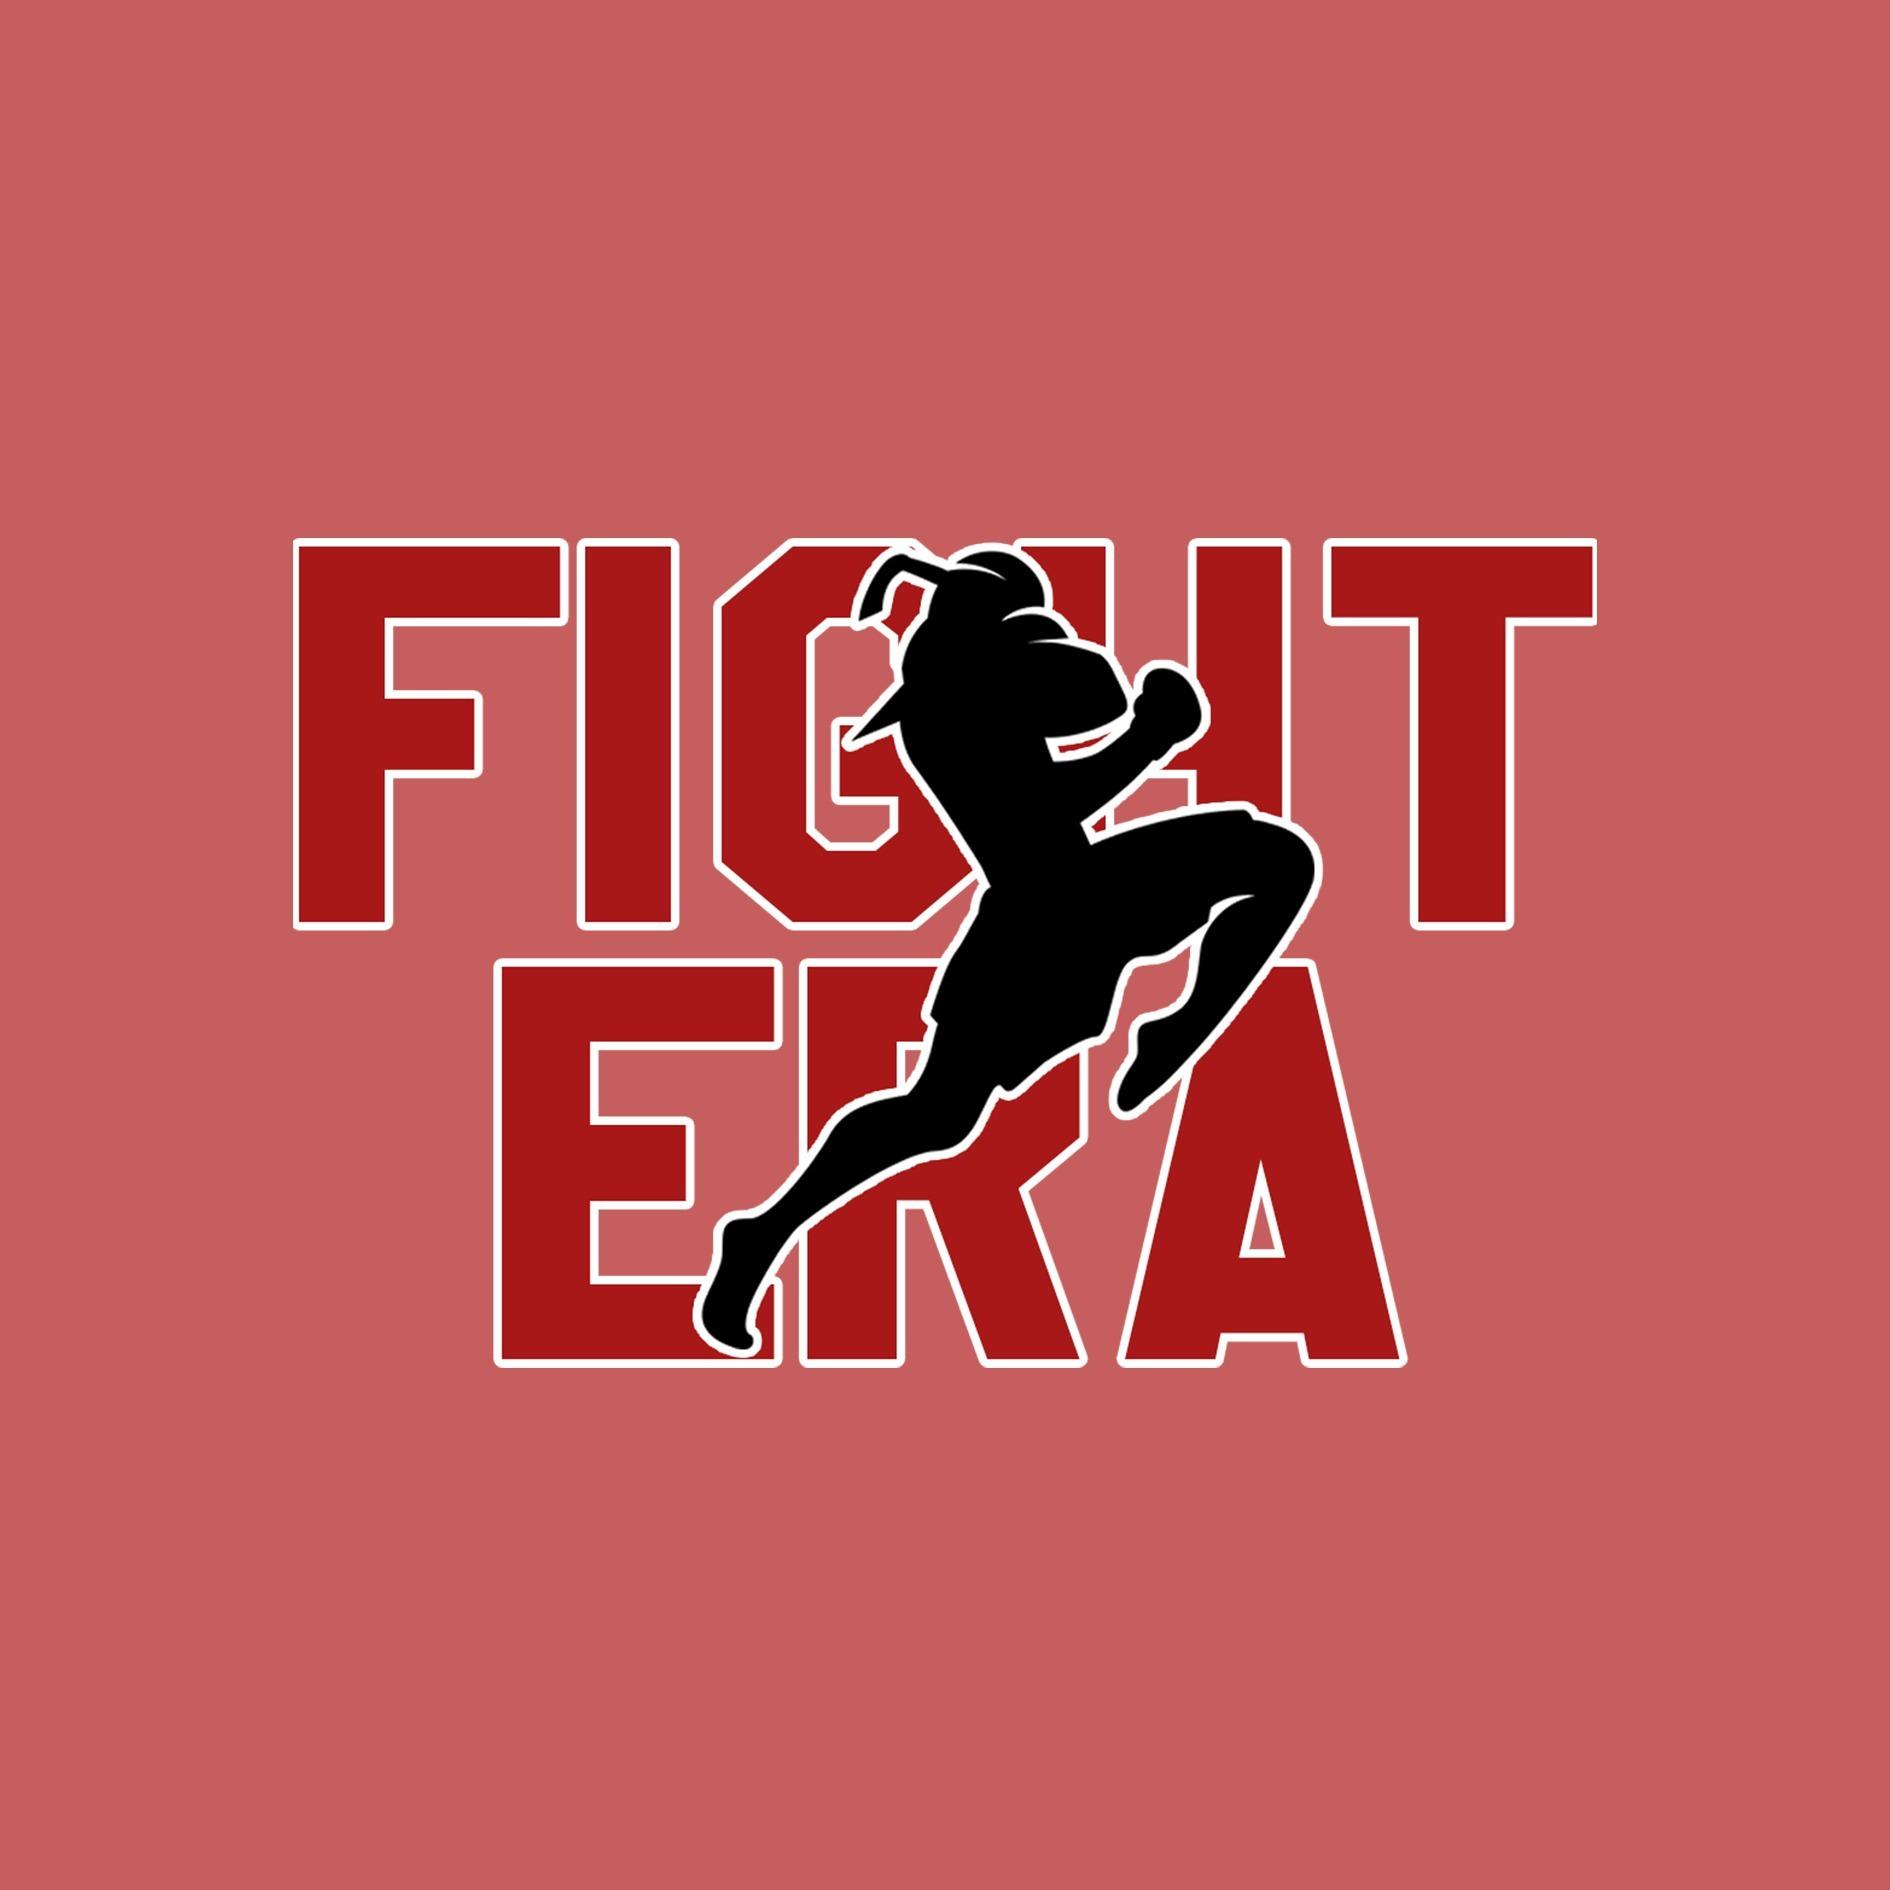 Fight Era Podcast - پادکست عصر مبارزه